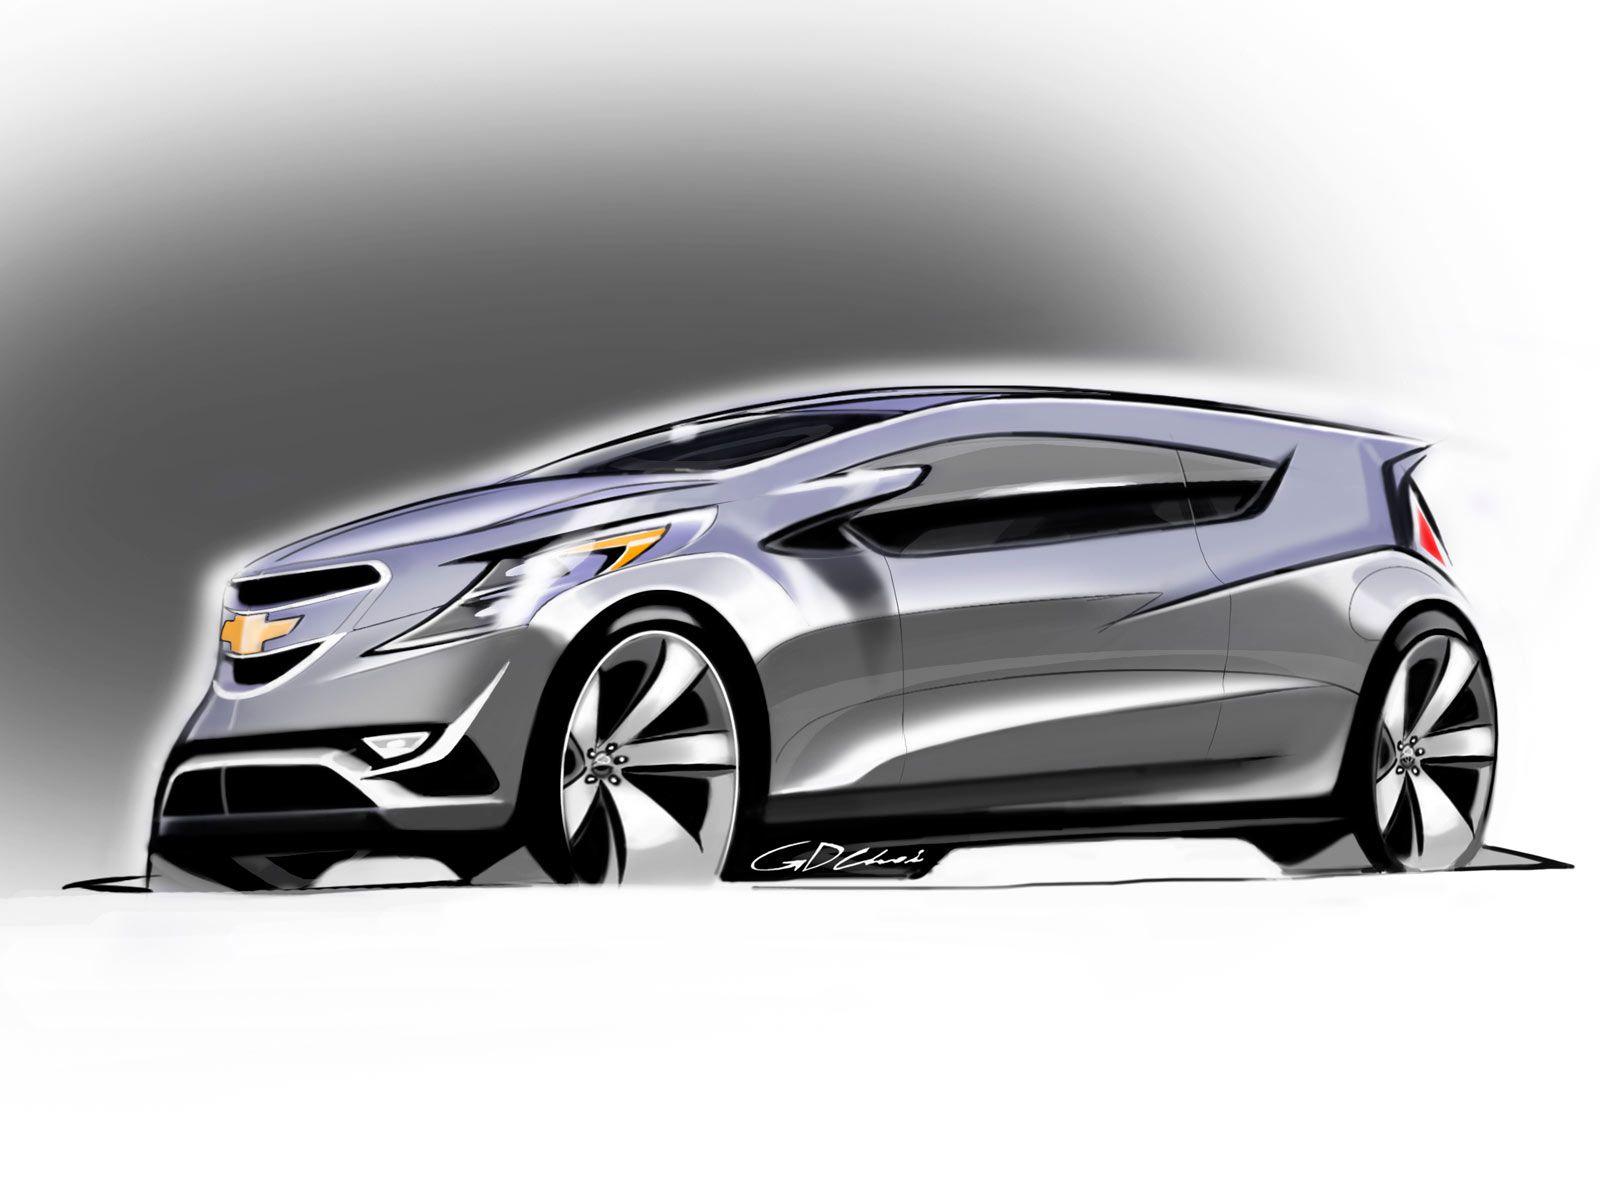 Chevrolet Spark Design Sketch Chevrolet Spark Chevrolet Volt